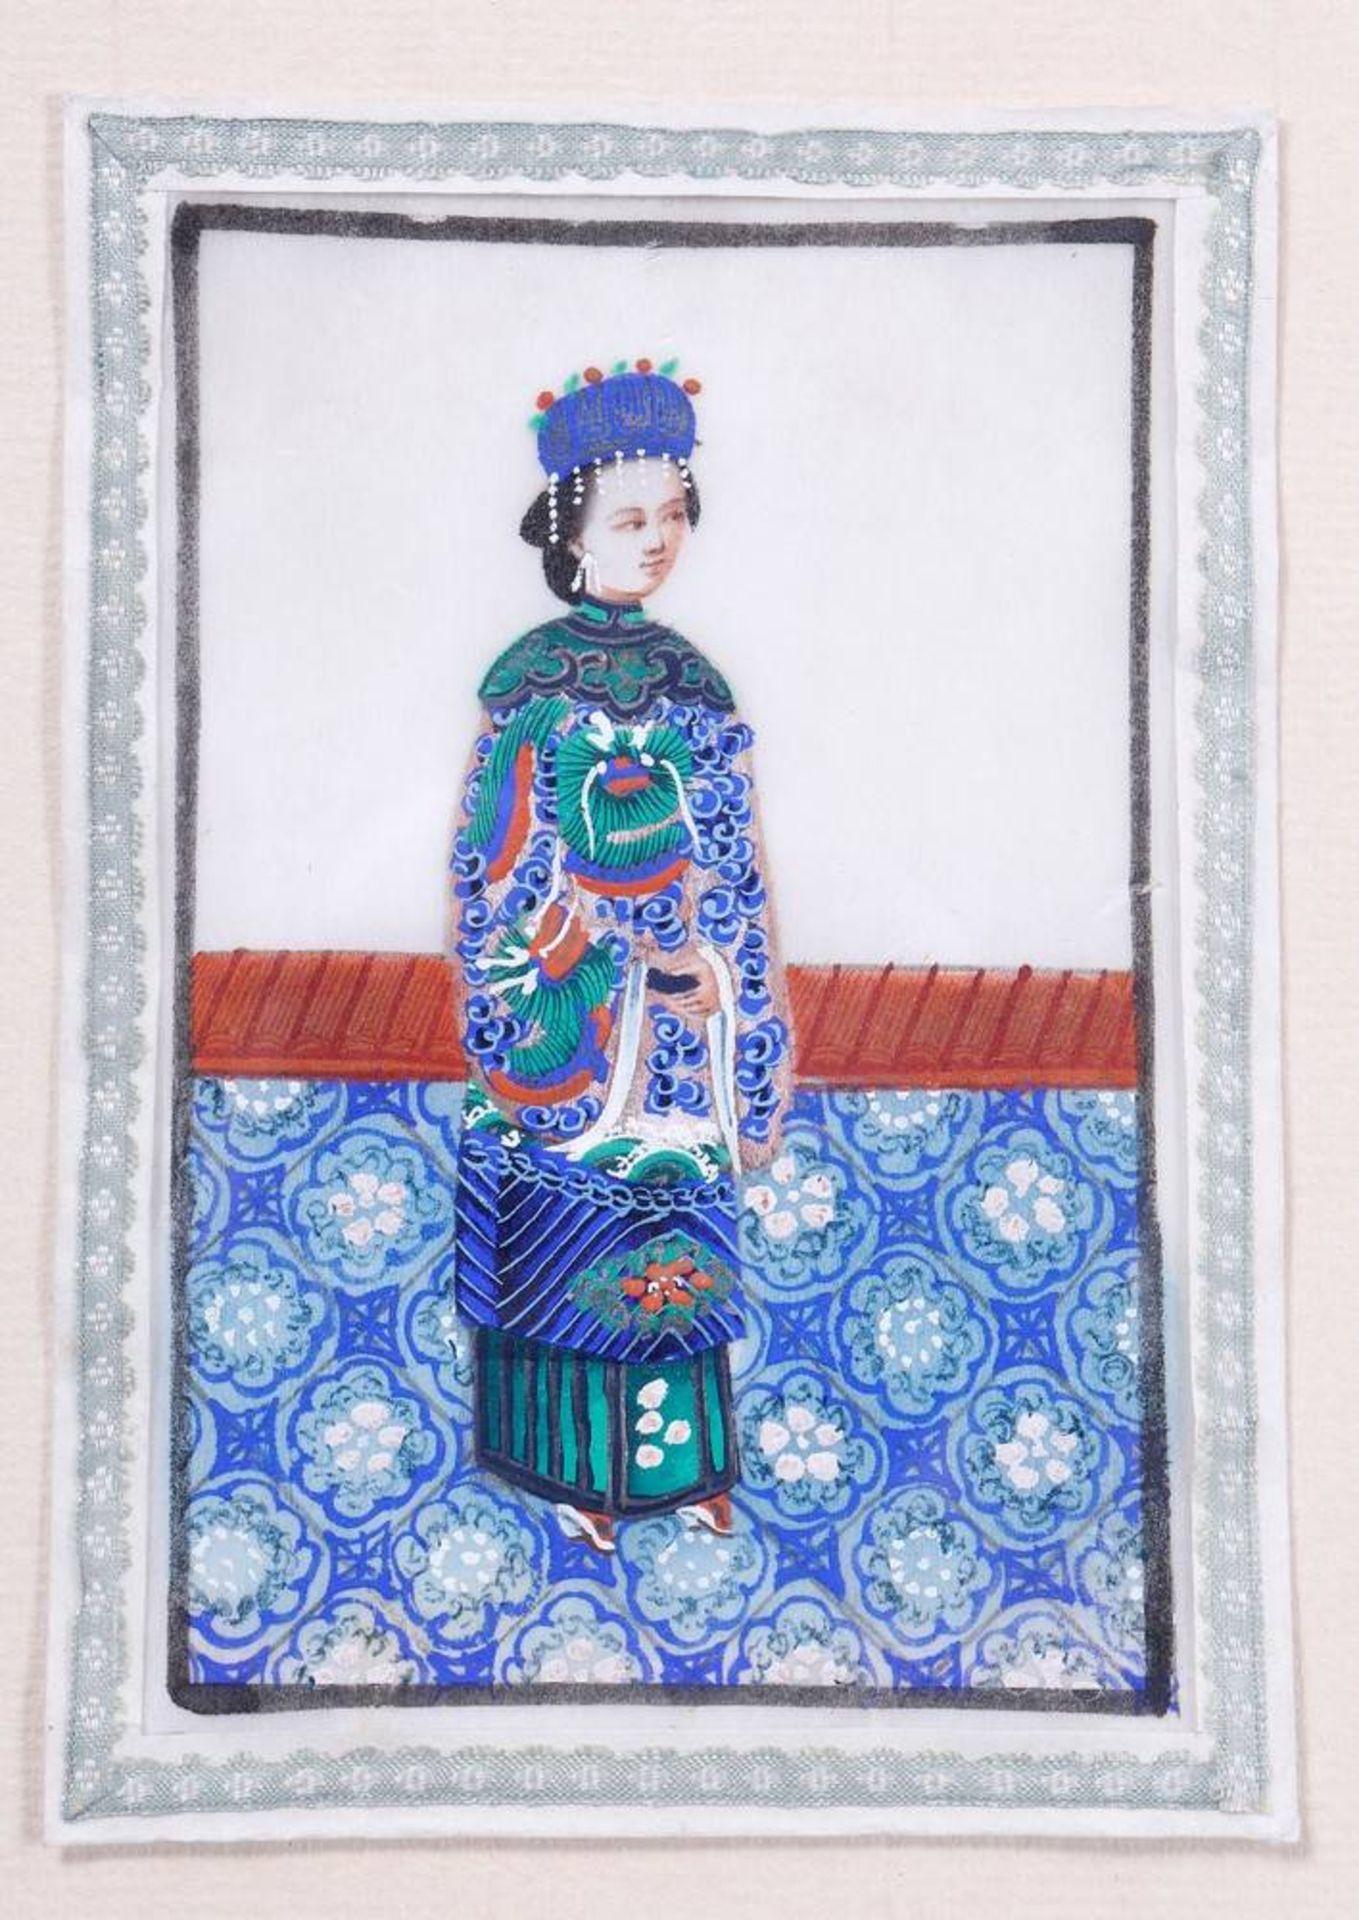 3 kleine Portraits, China, 19.Jh. - Image 2 of 2